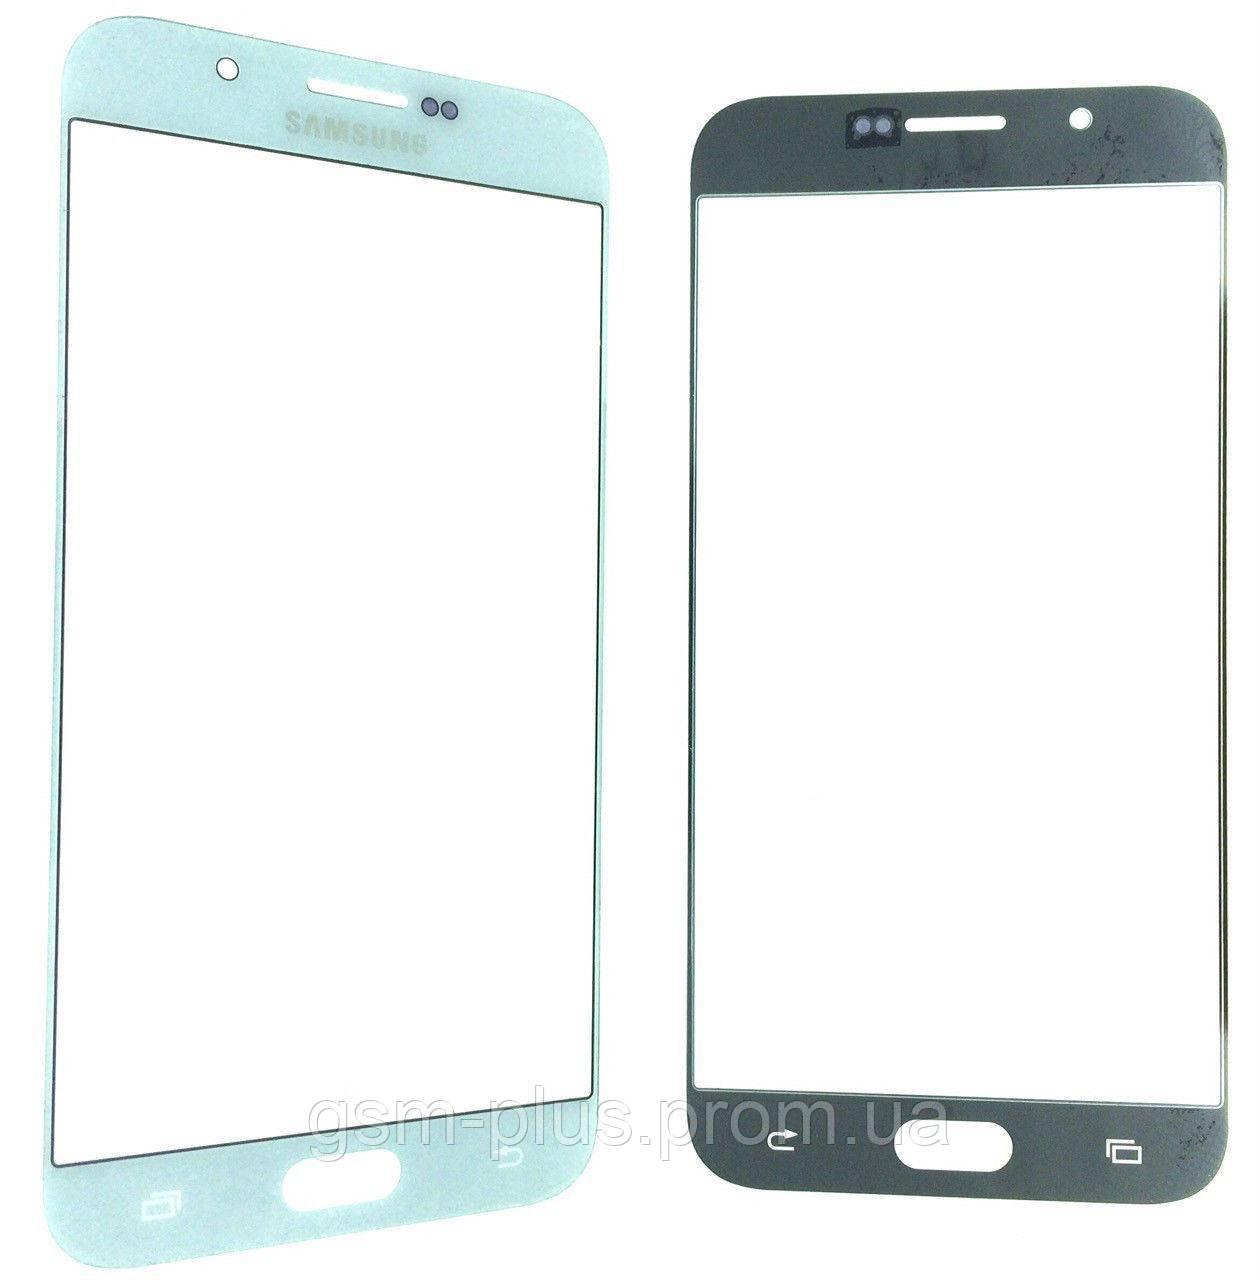 Стекло дисплея Samsung Galaxy A8 SM-A8000 White (для переклейки)